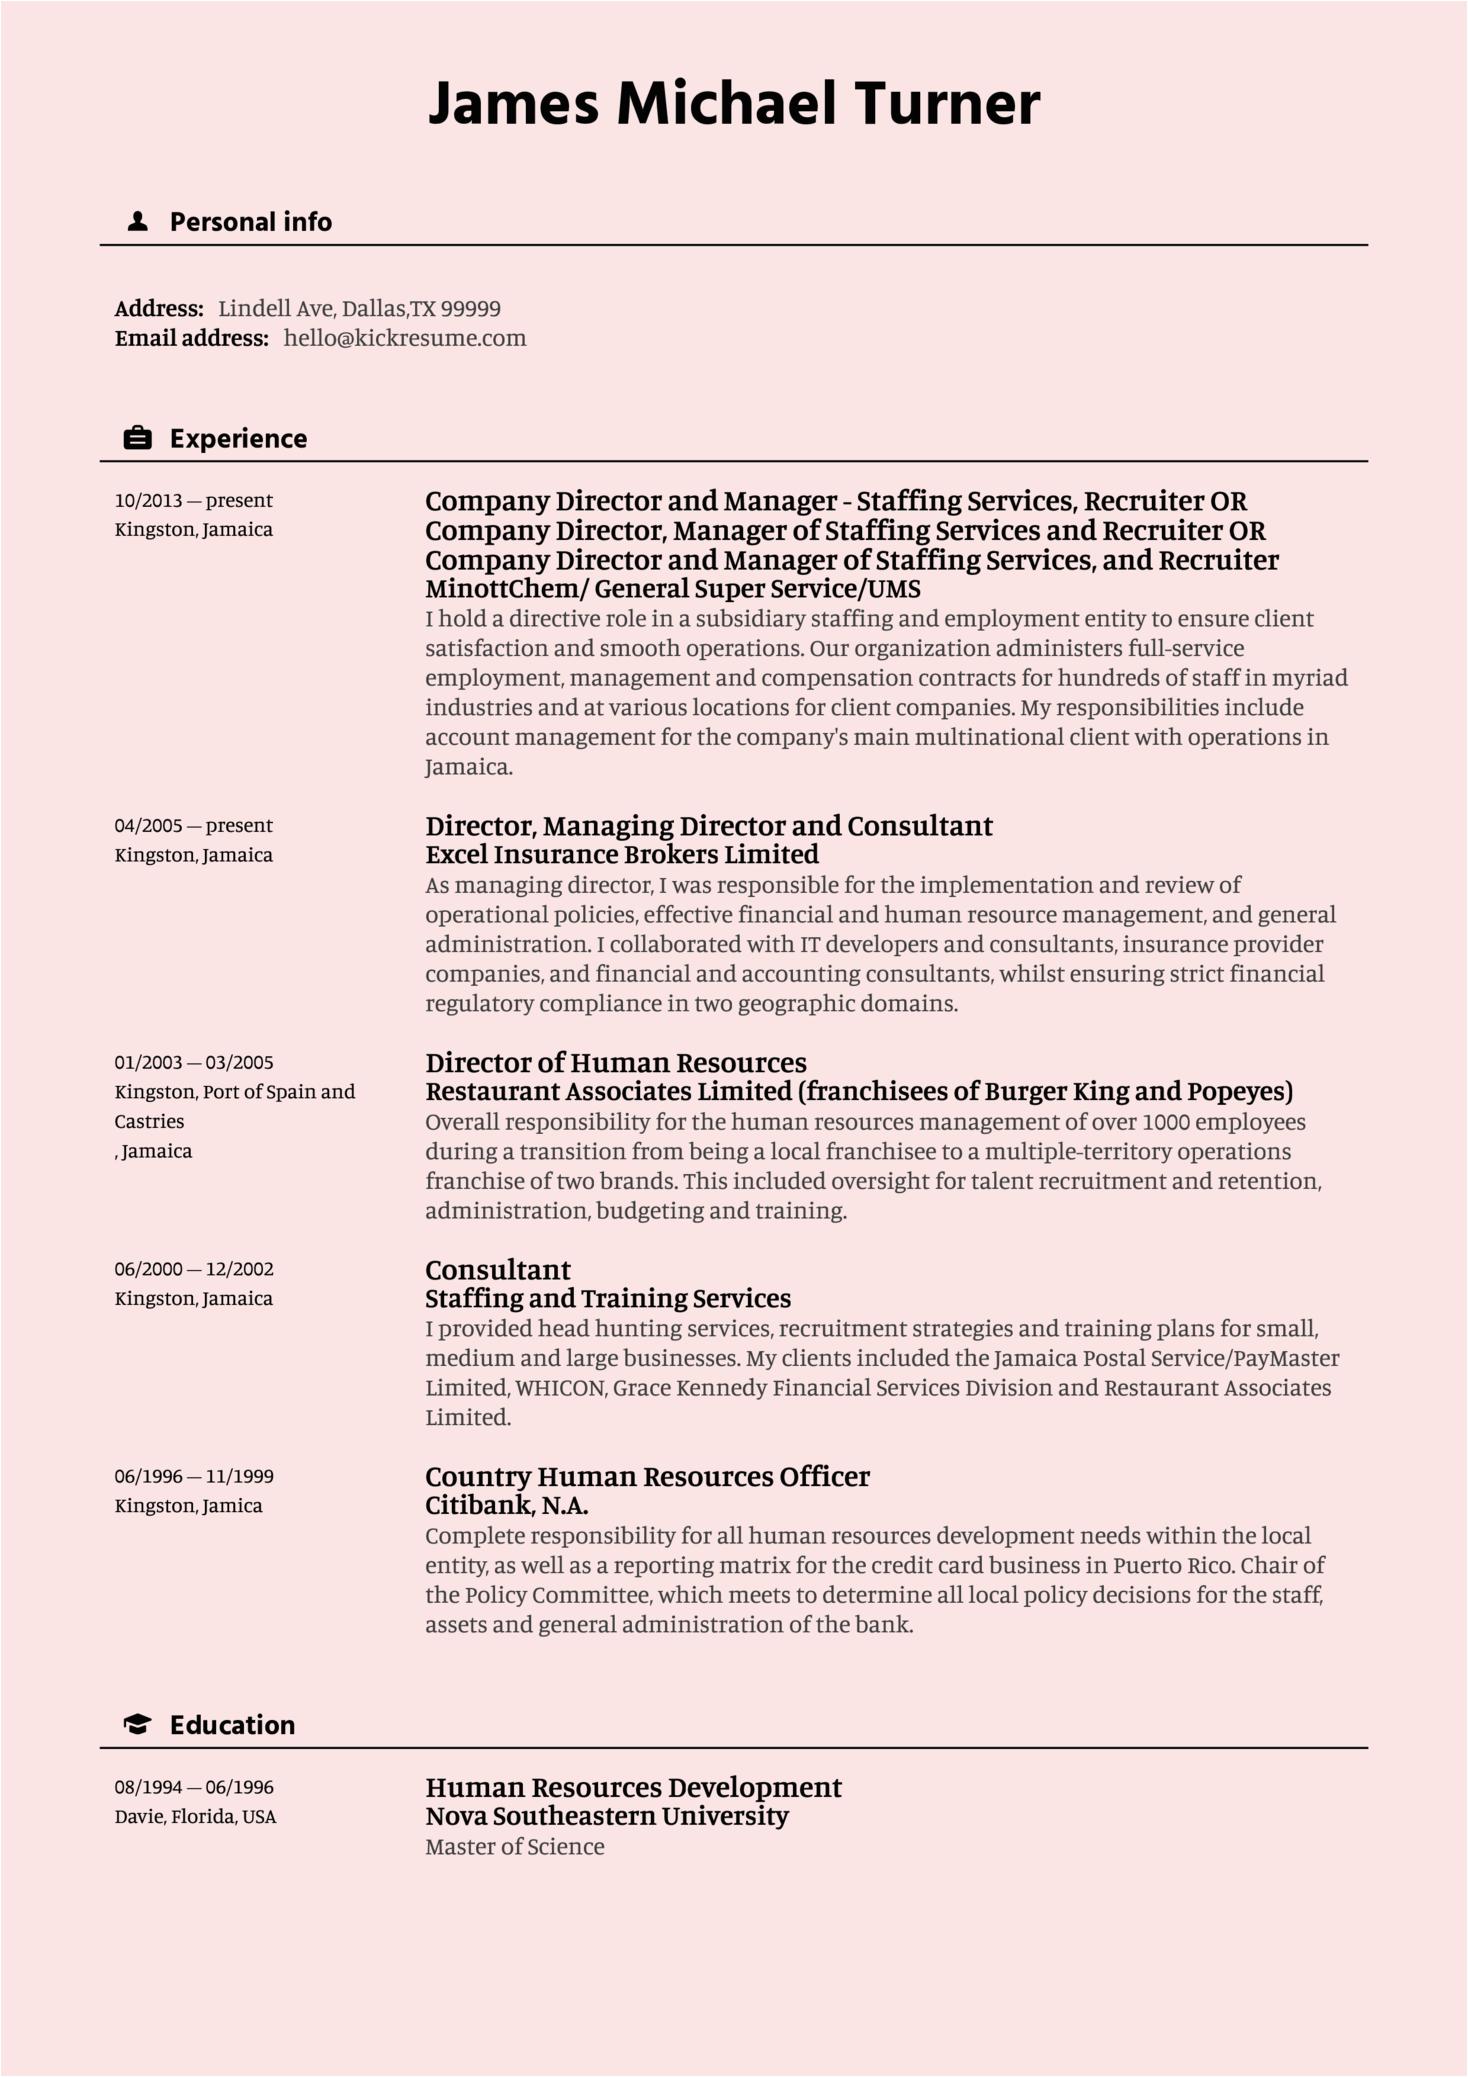 Sample Resume Of A Data Analyst Resume Examples by Real People Data Analyst Resume Sample